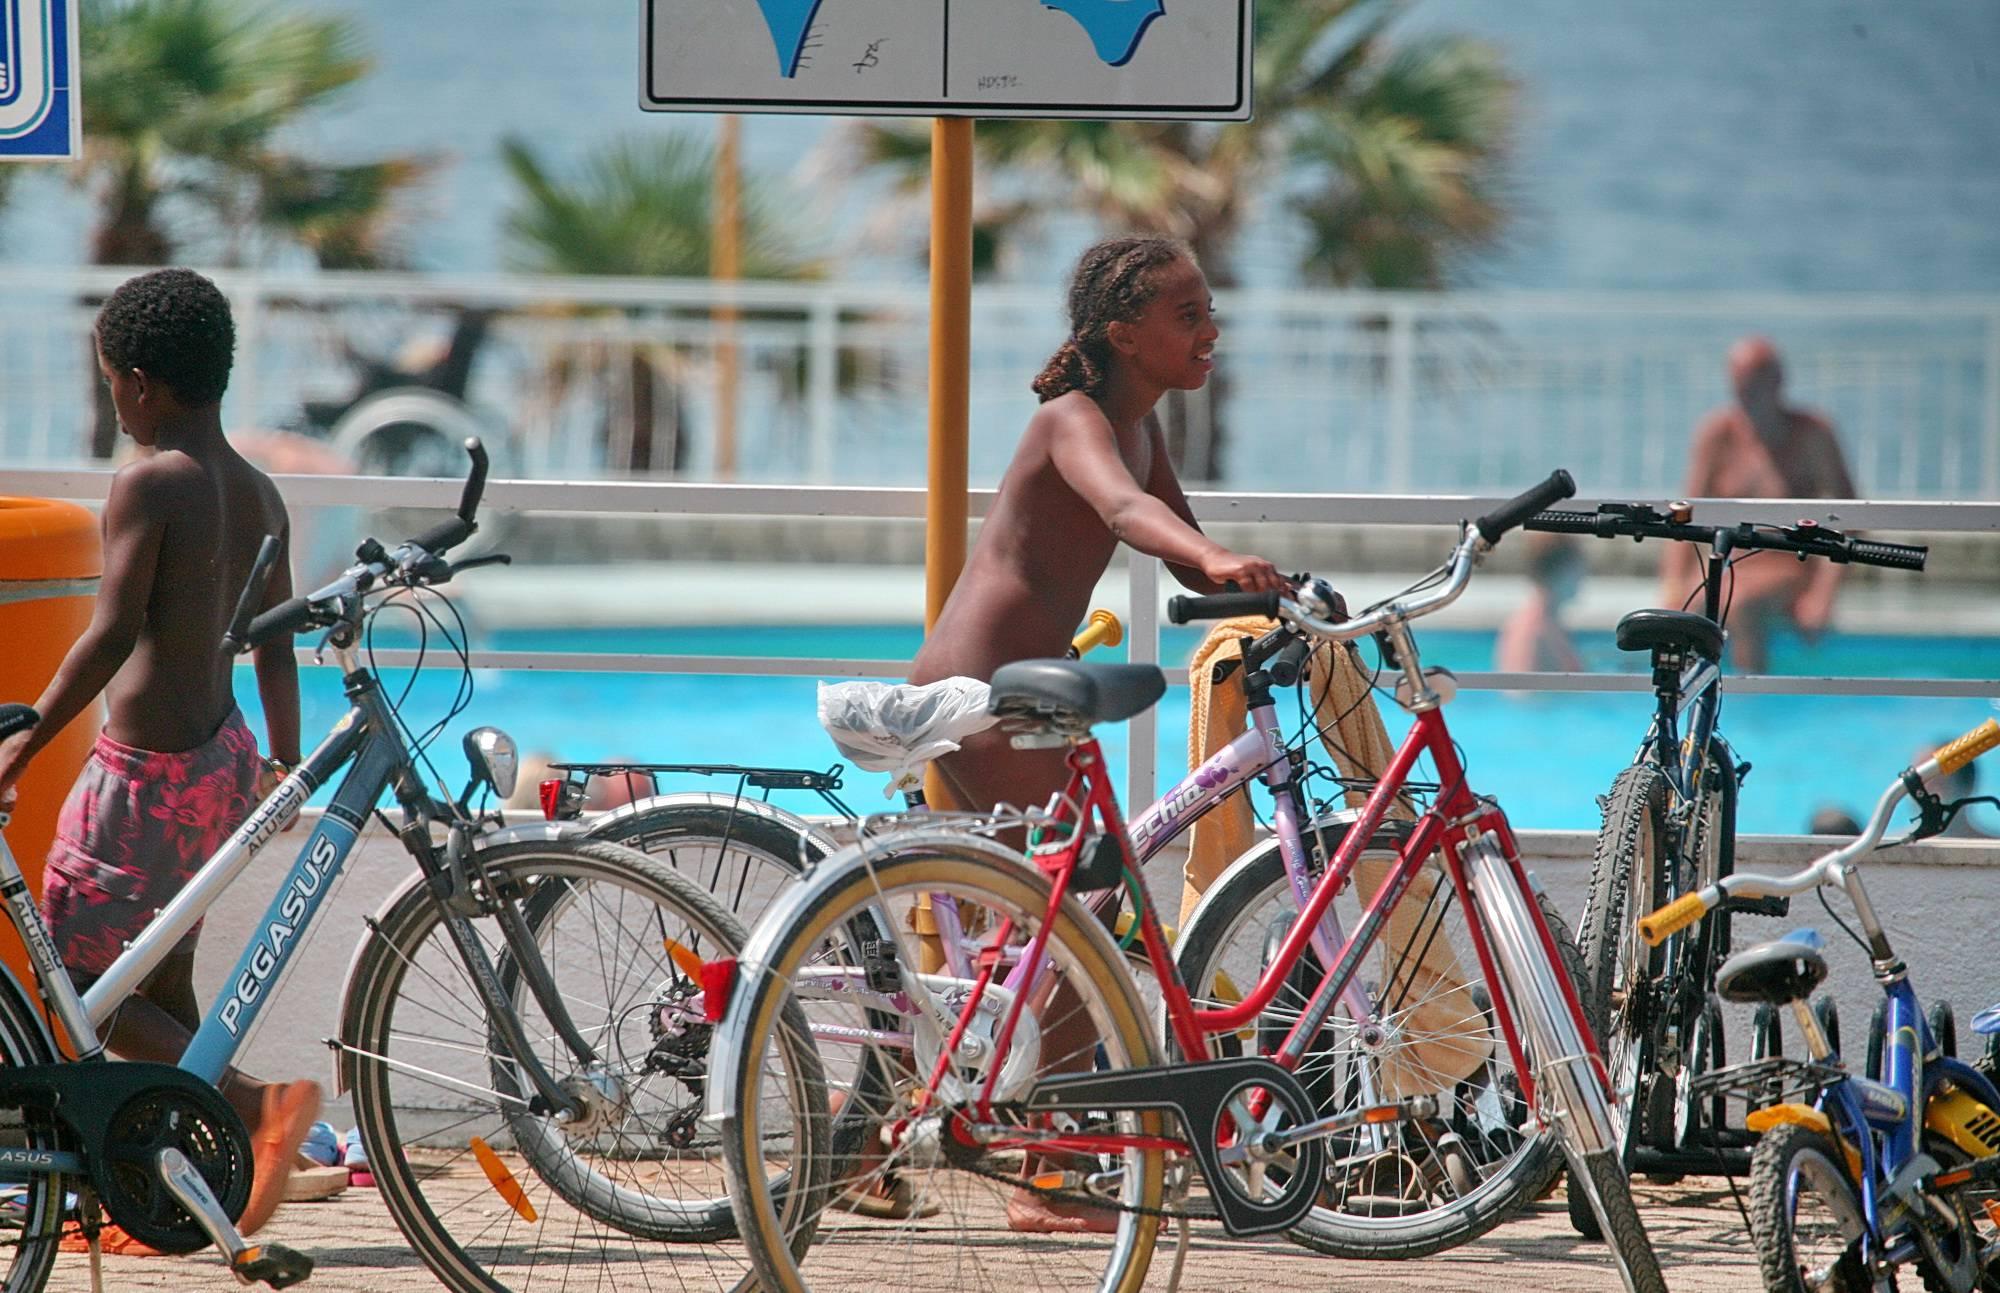 Biking Stand Photo Gallery - 1